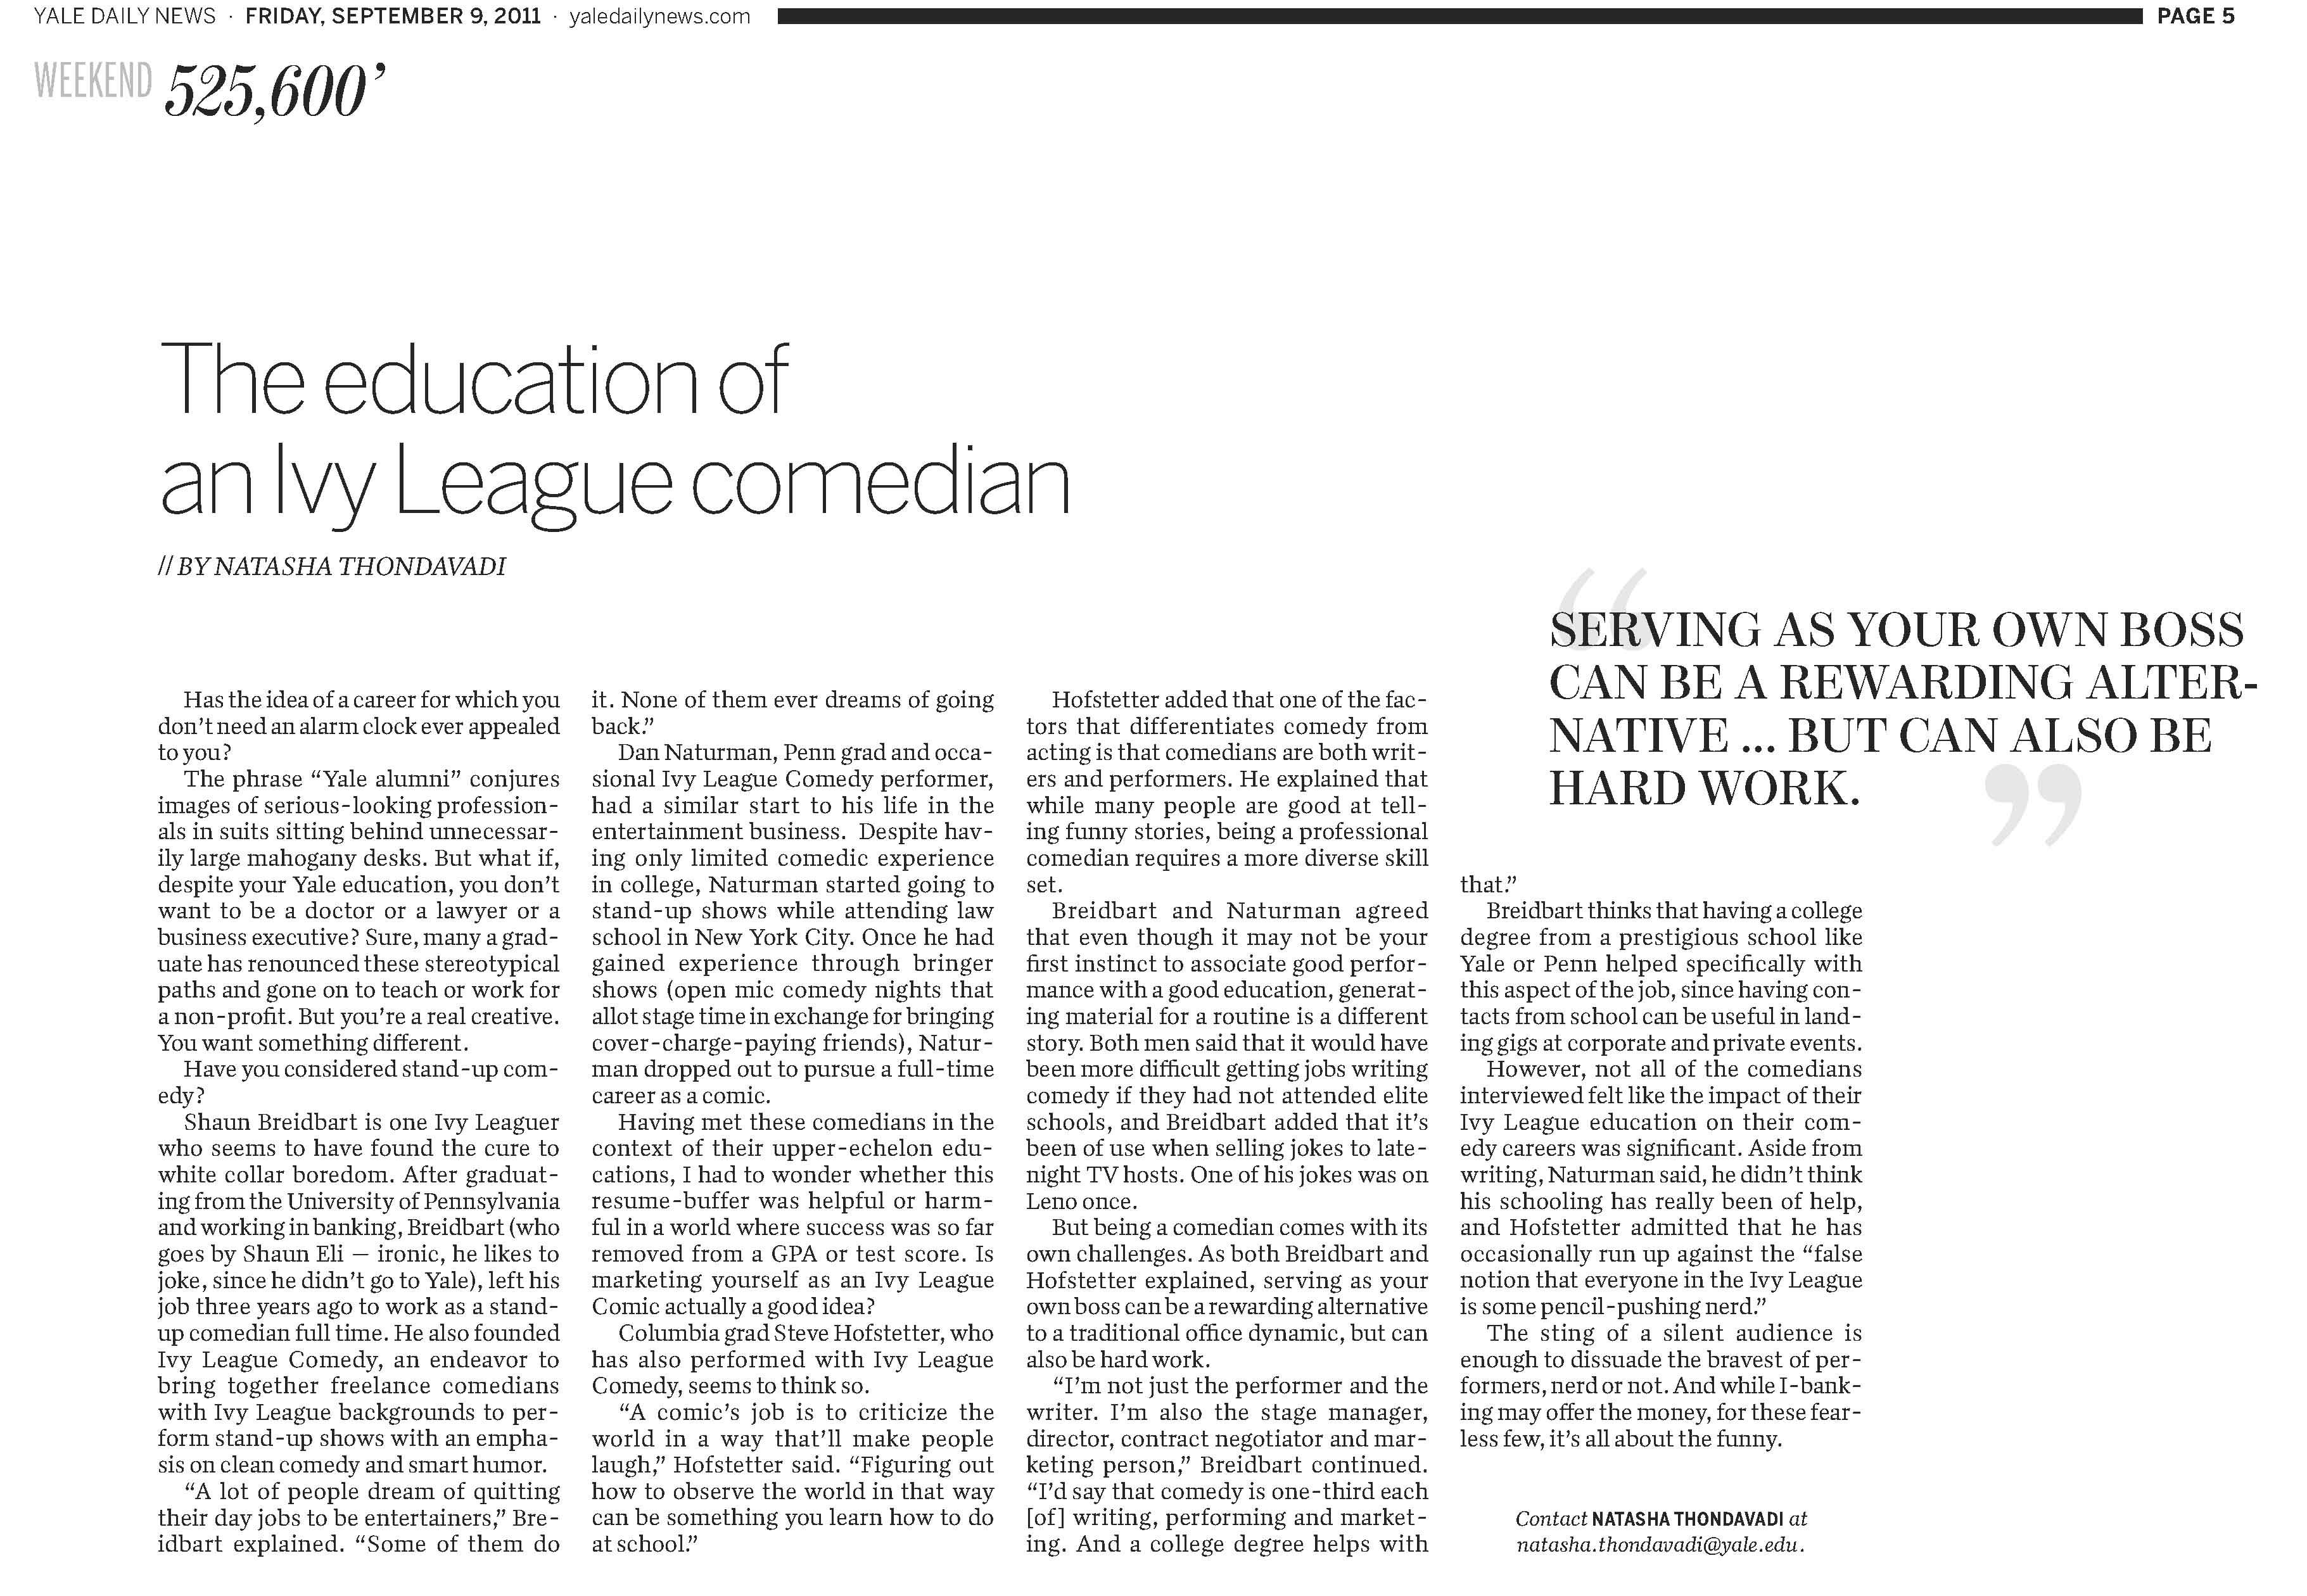 Yale Daily News article on Shaun Eli